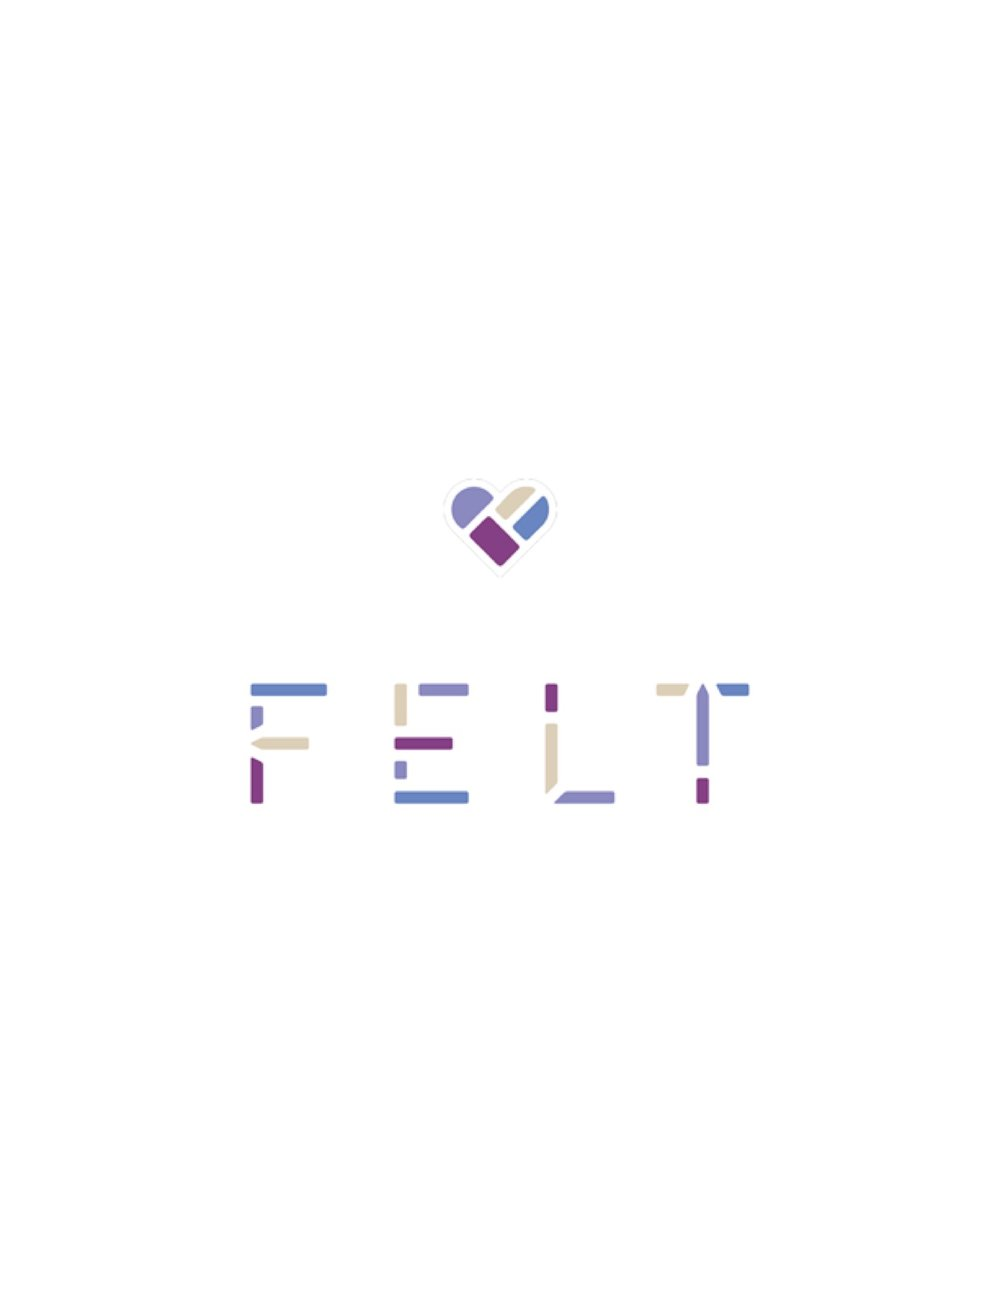 felt.jpg